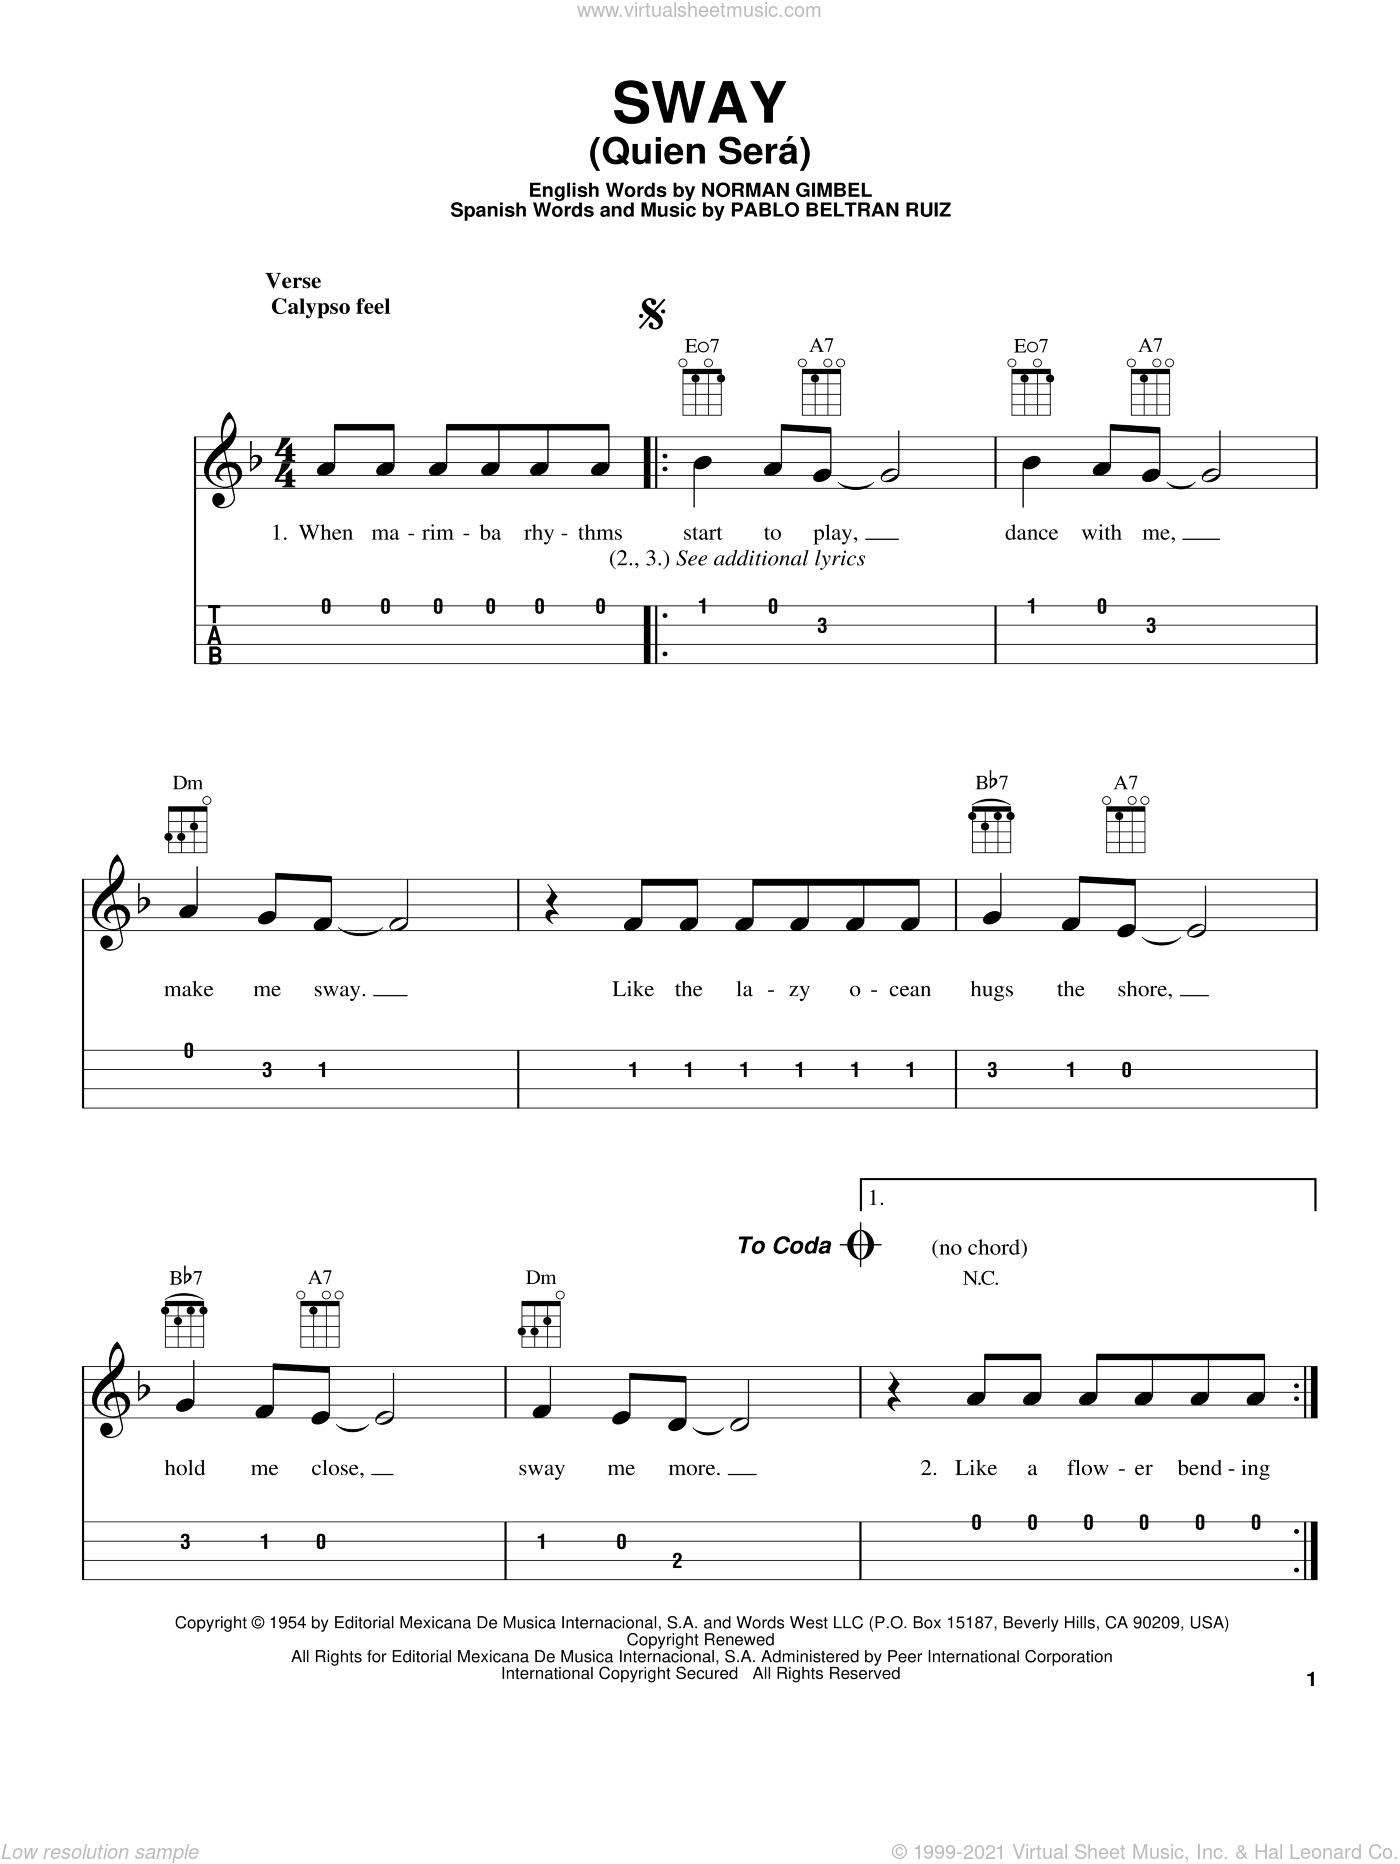 Sway (Quien Sera) sheet music for ukulele by Dean Martin, intermediate skill level